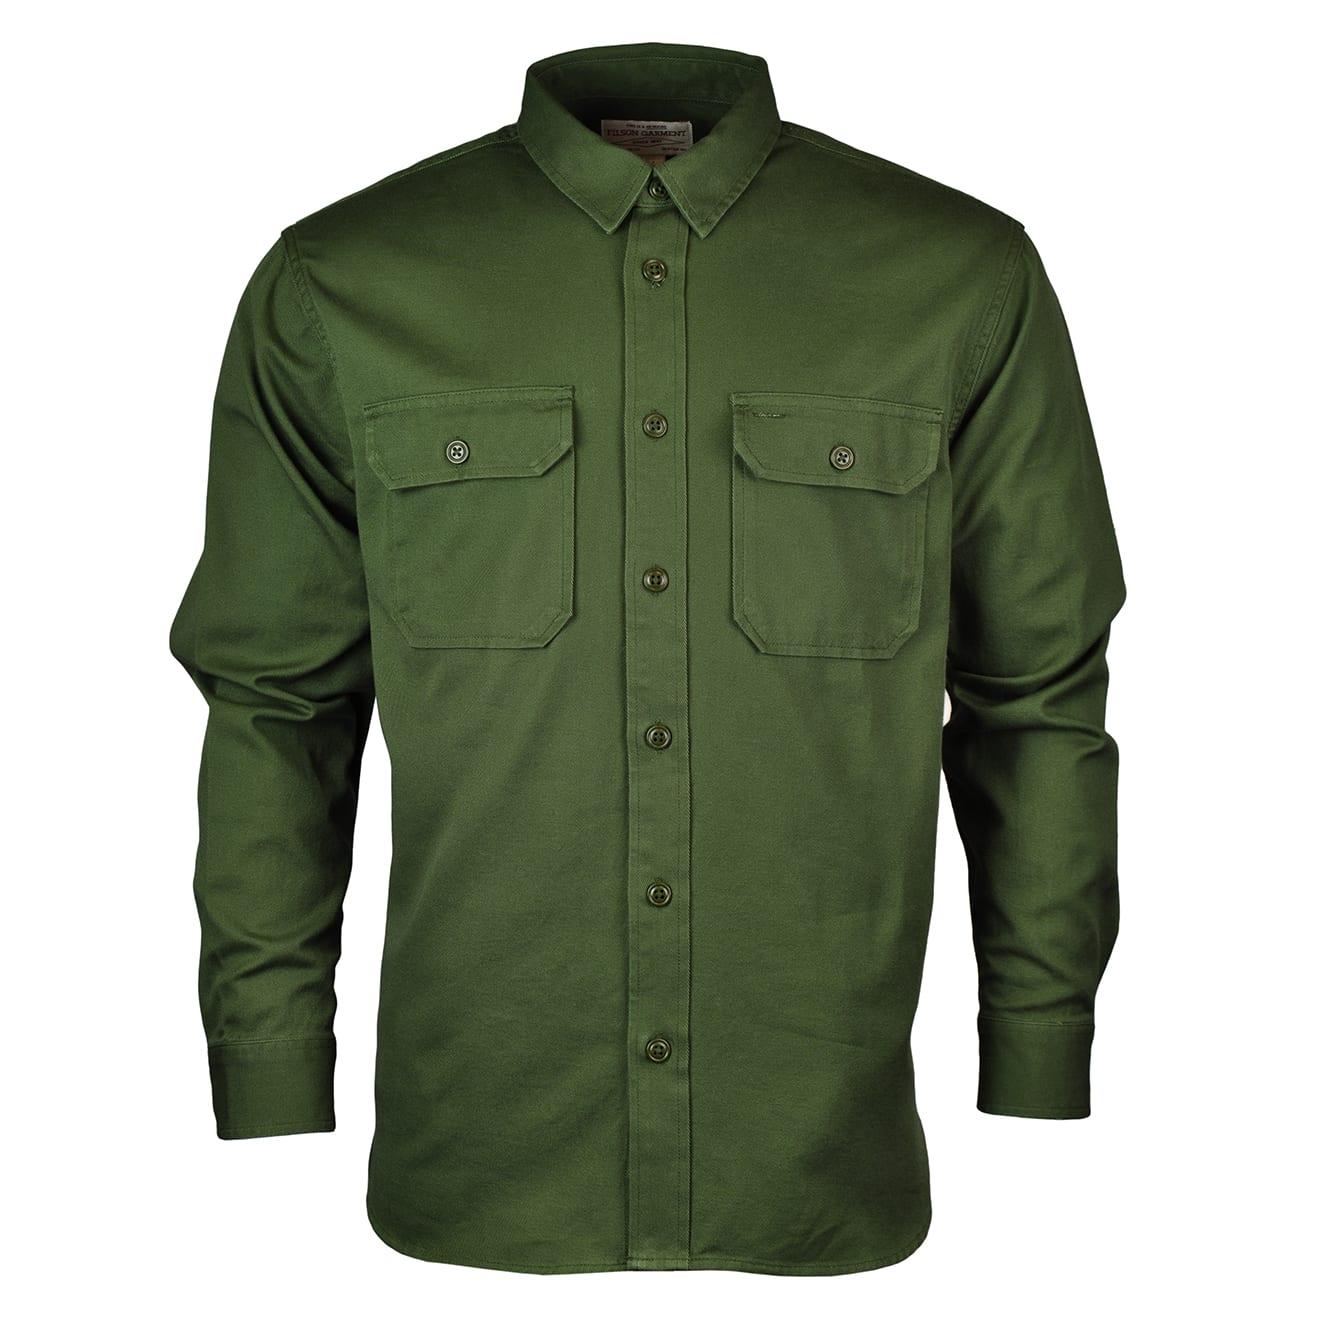 Filson 6oz Drill Chino Shirt Olive